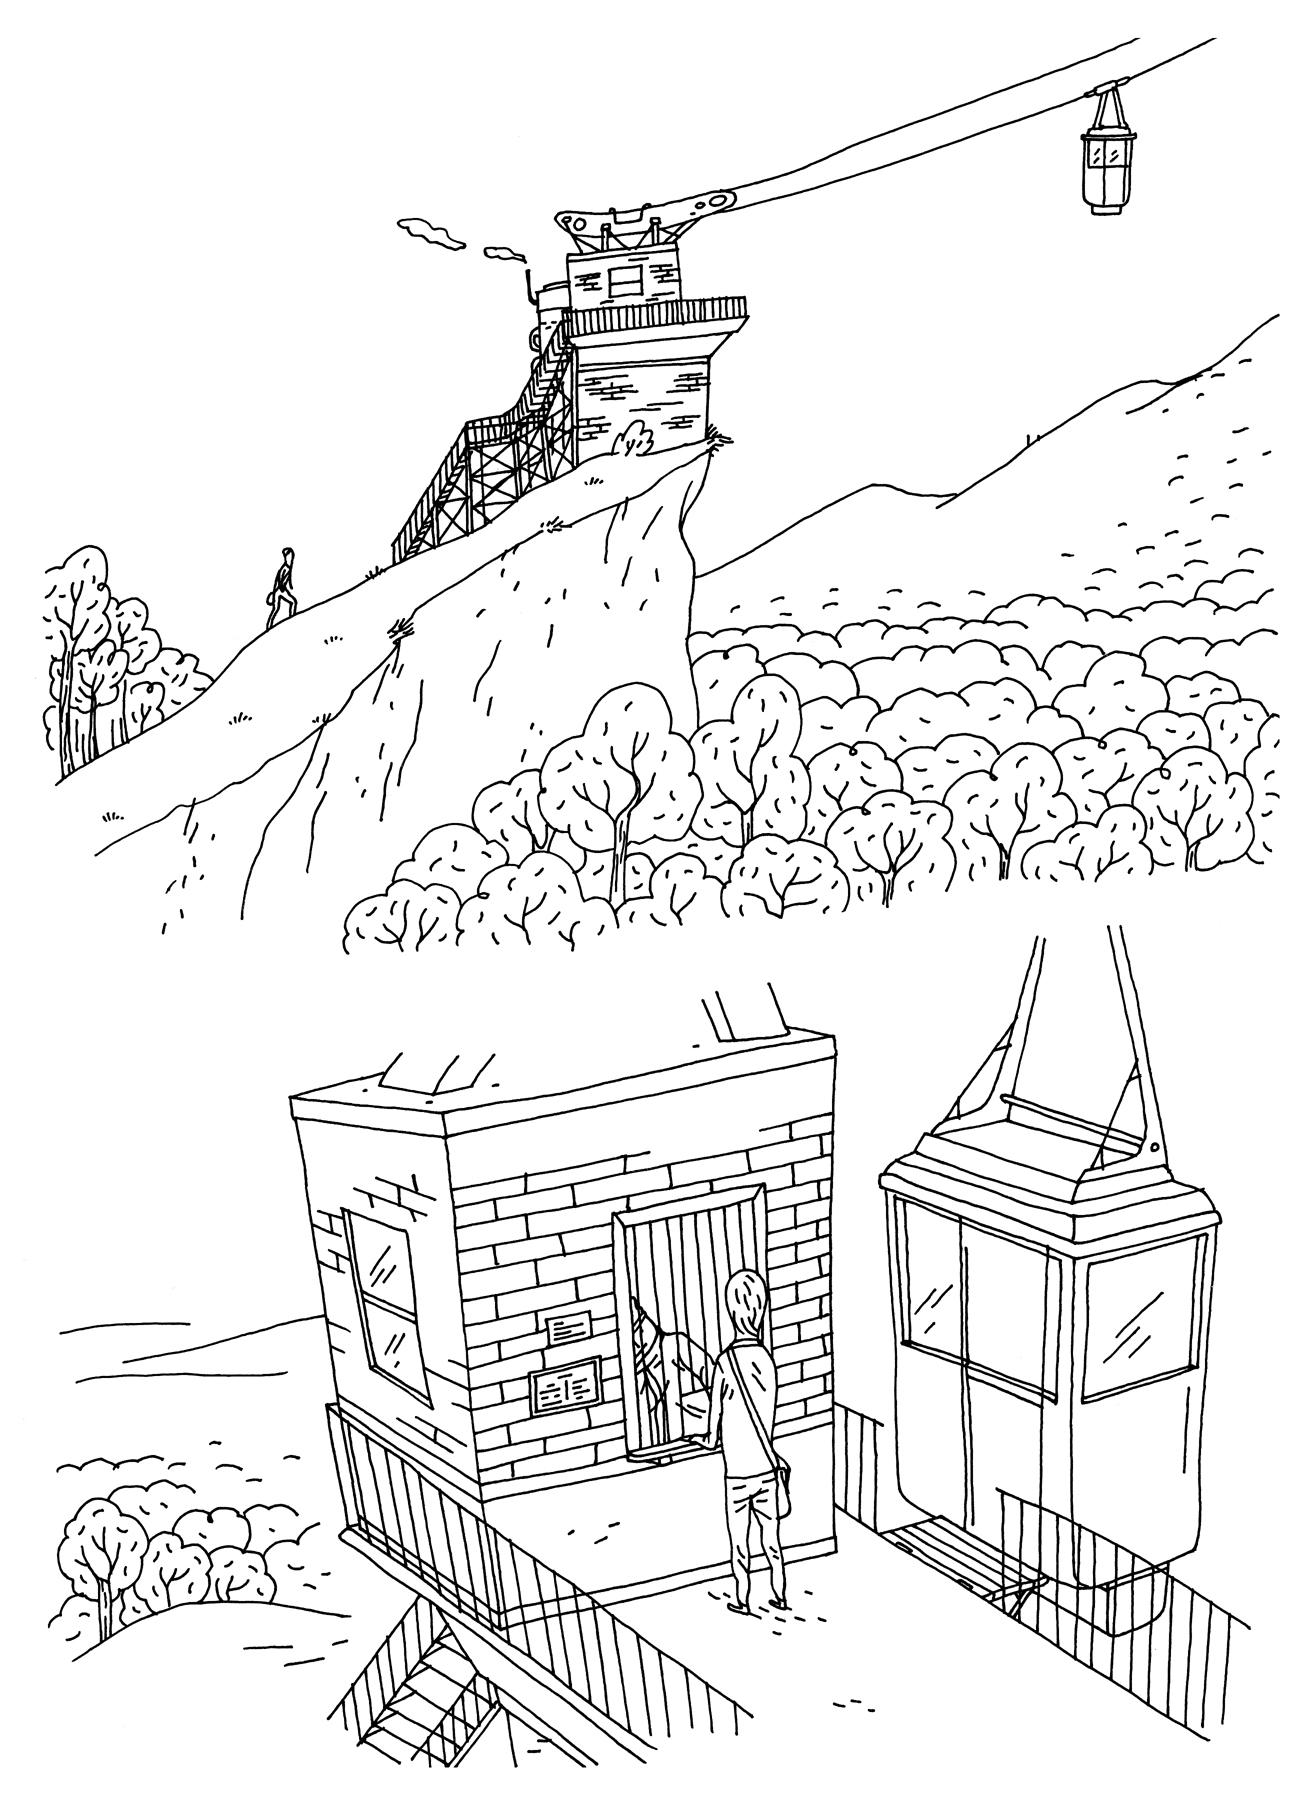 extrait 1 | Bande dessinée | Eugène